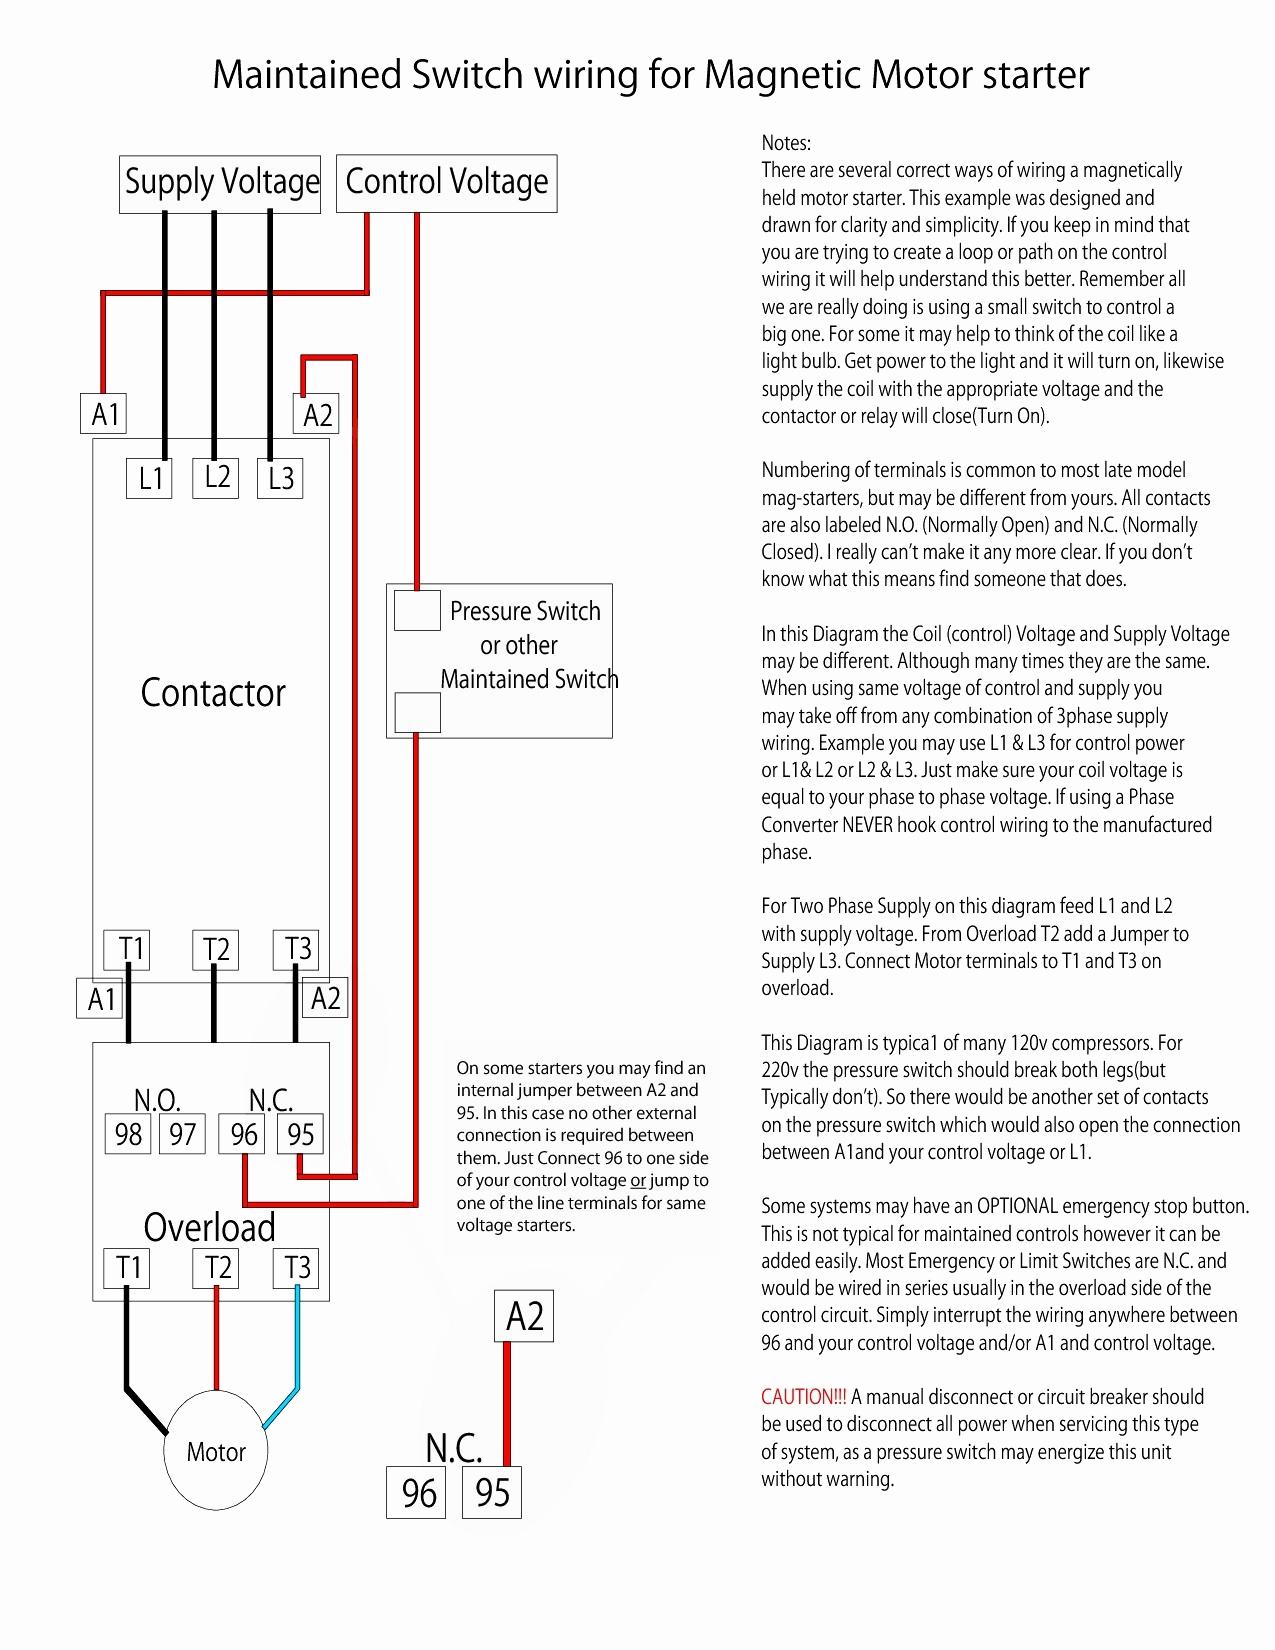 [SCHEMATICS_43NM]  Brunswick A2 Wiring Diagram - Wiring Diagram For Speedtech Light Bars for Wiring  Diagram Schematics | A2 Wiring Diagram |  | Wiring Diagram Schematics